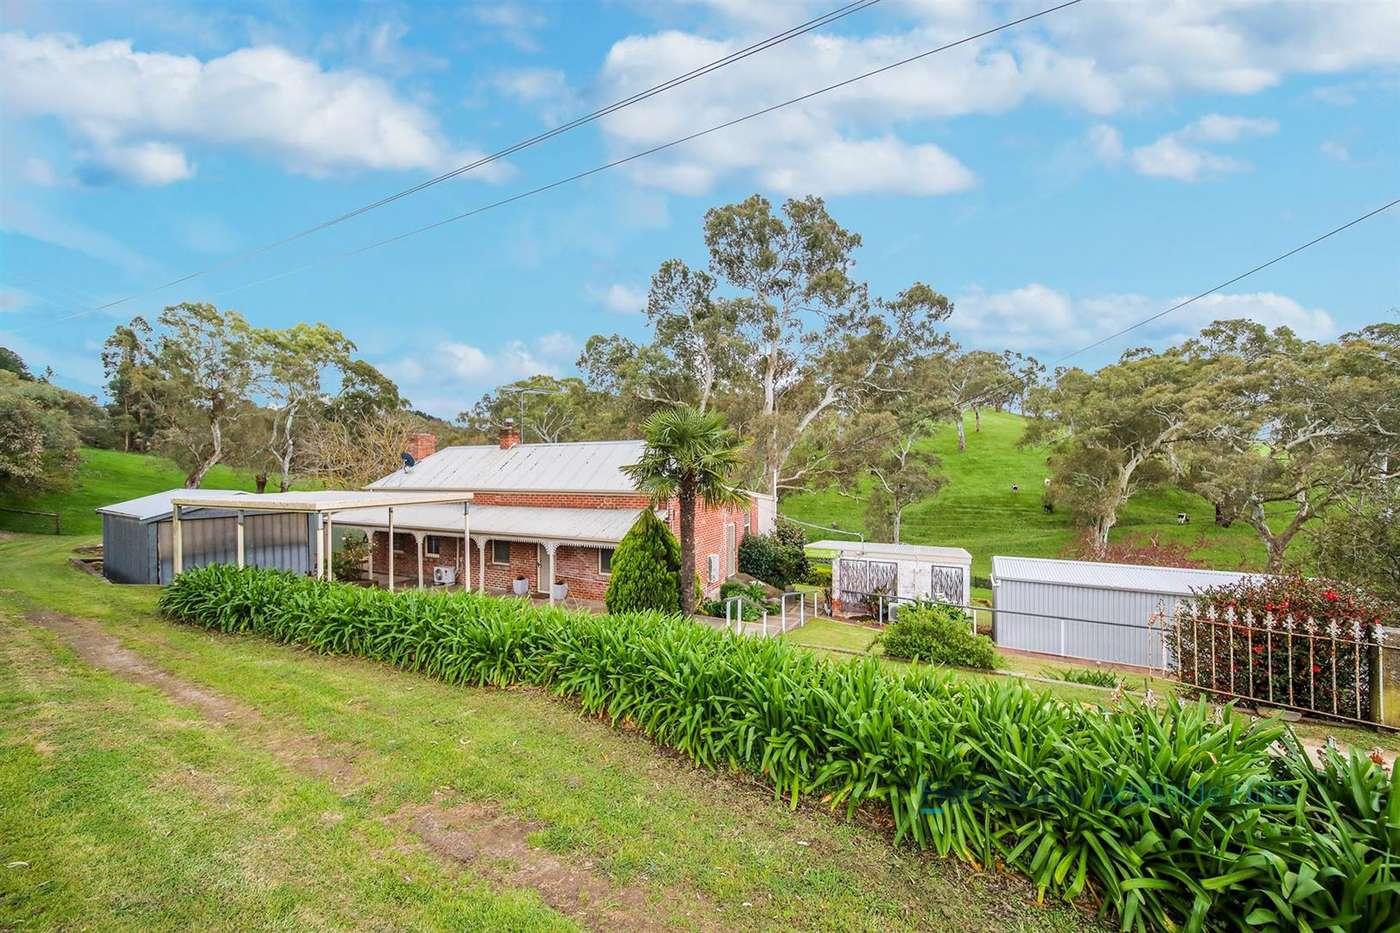 Main view of Homely house listing, 2395 Mount Barker Rd, Littlehampton via, Totness, SA 5250